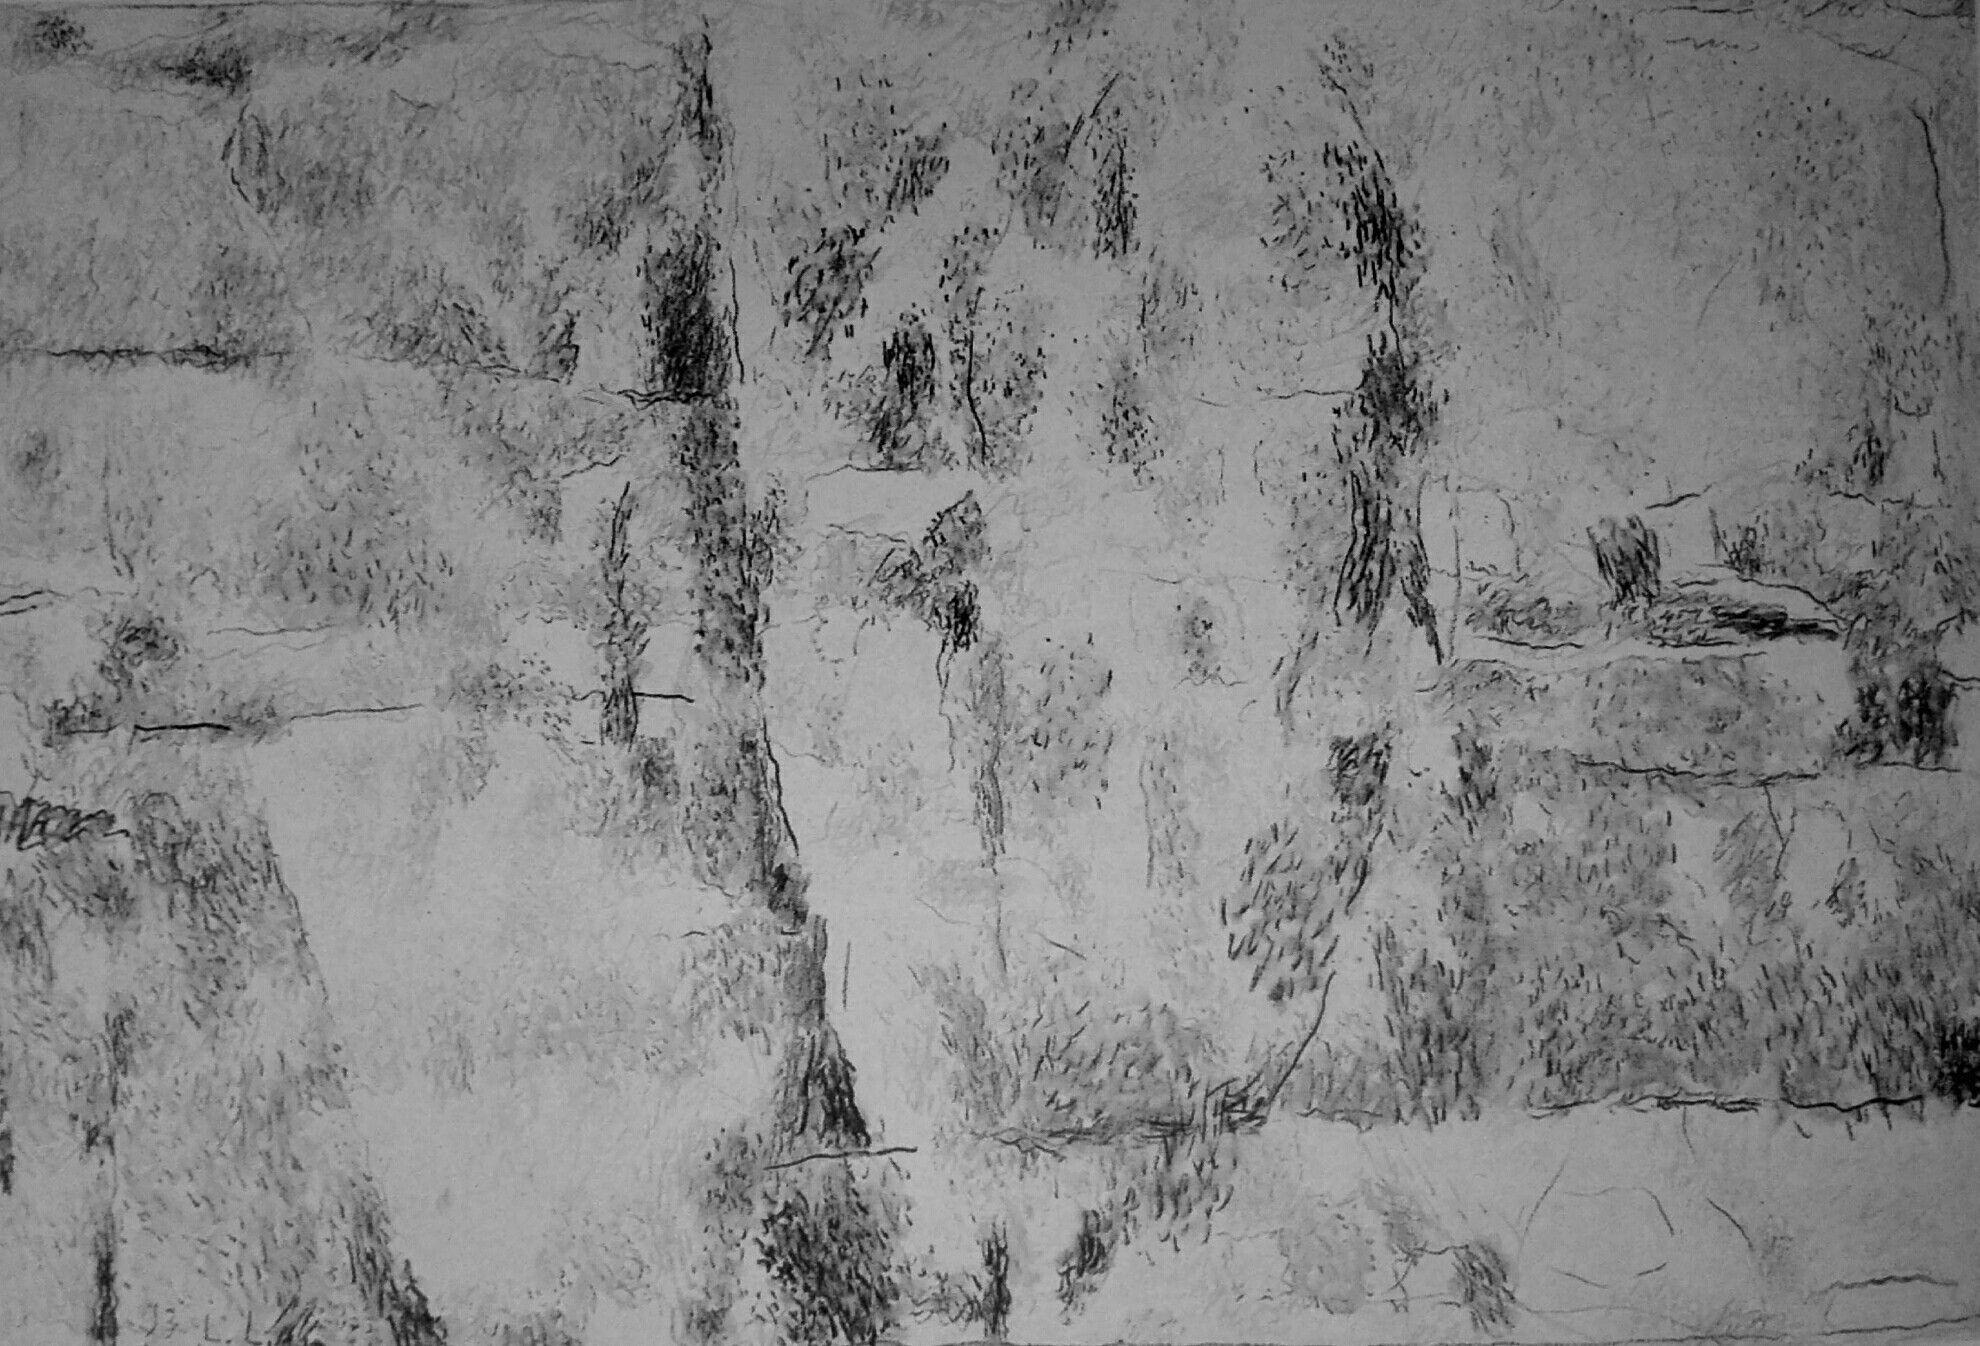 Bosco Sacro carboncino su carta 750x1100mm 1991 Mac,n Monsummano